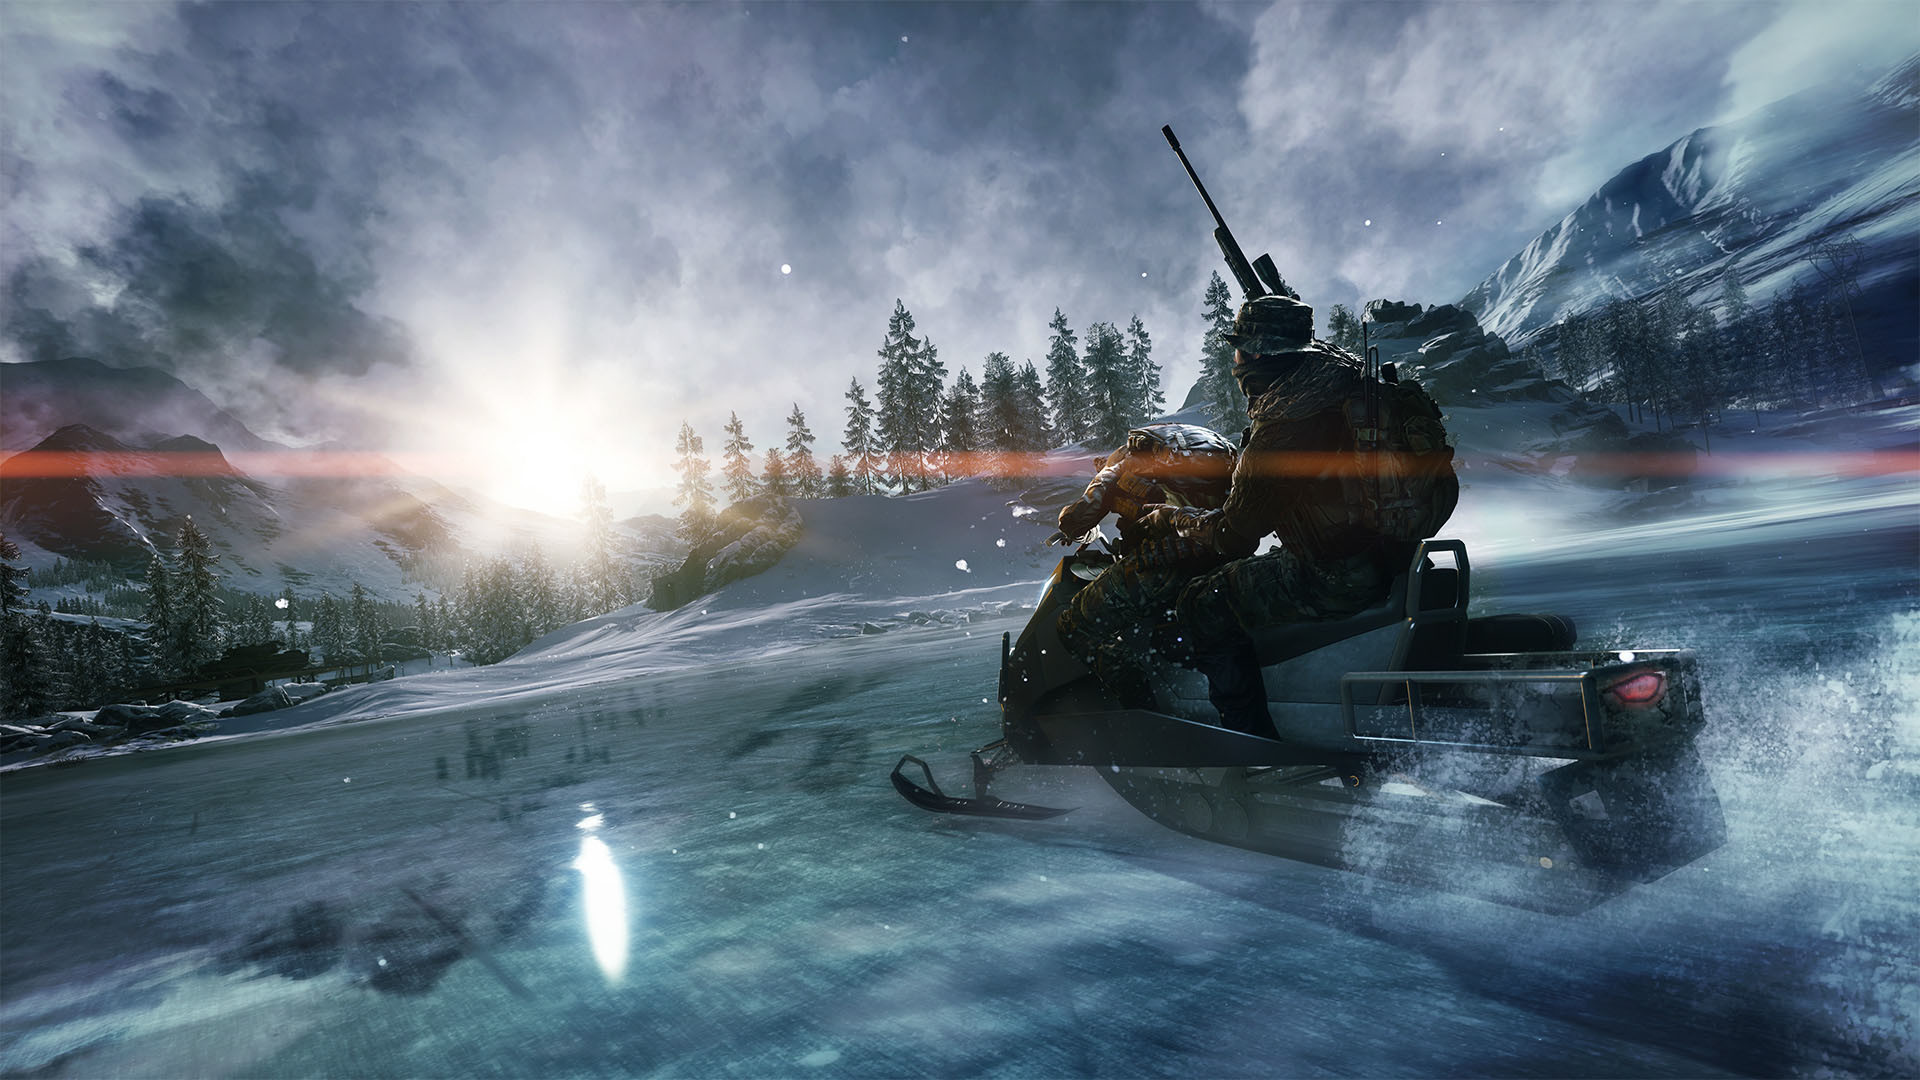 Battlefield 4 Final Stand – Snowmobile on Hammerhead map wallpaper